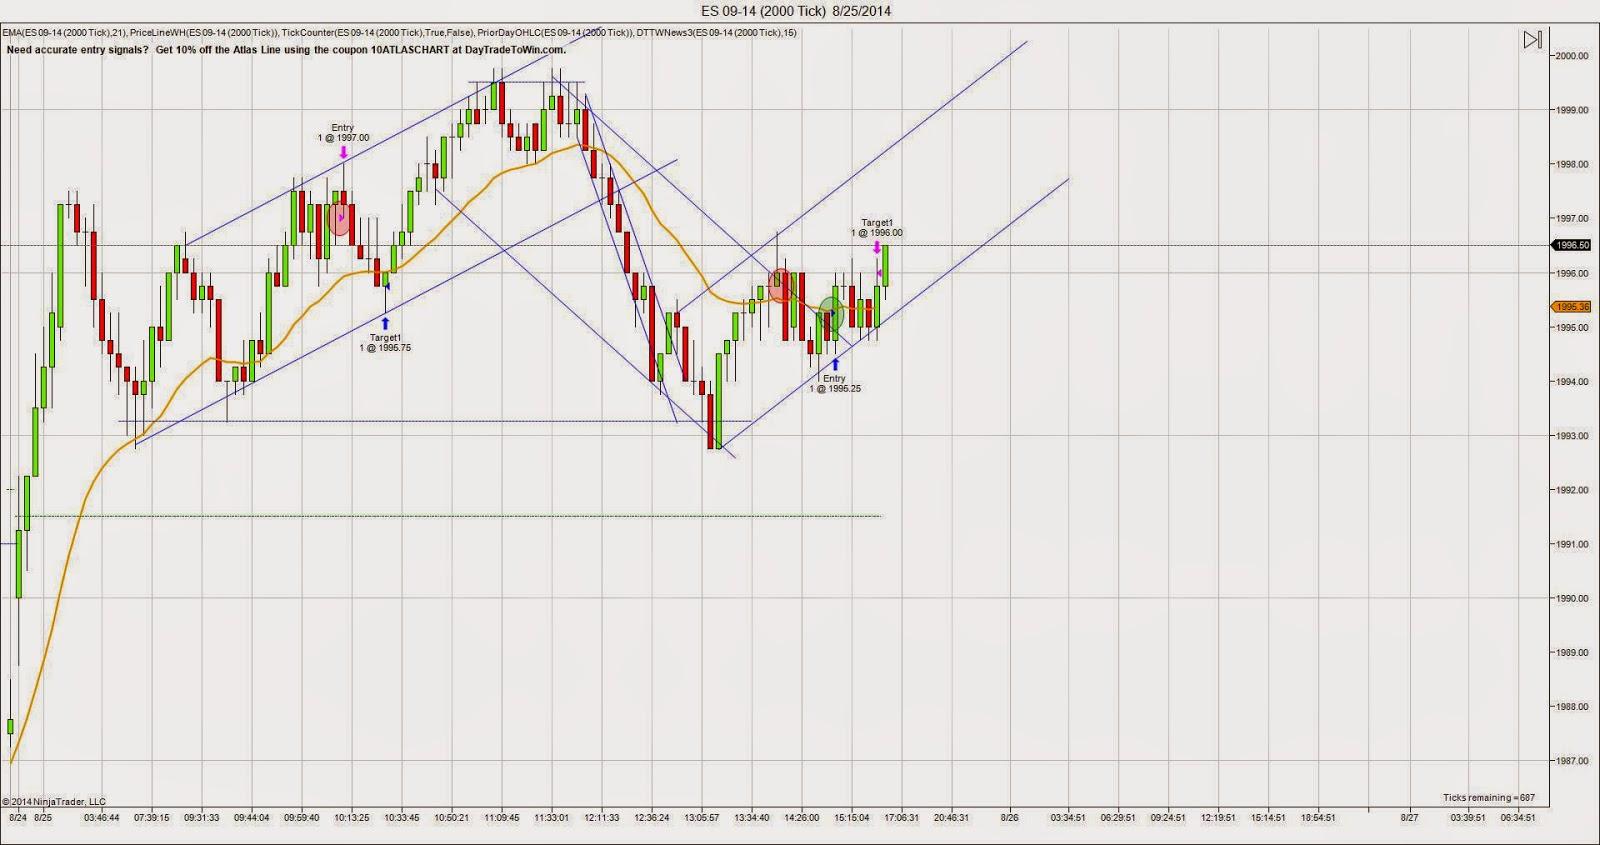 E-mini S&P 500 Futures chart for Monday 8/25/14